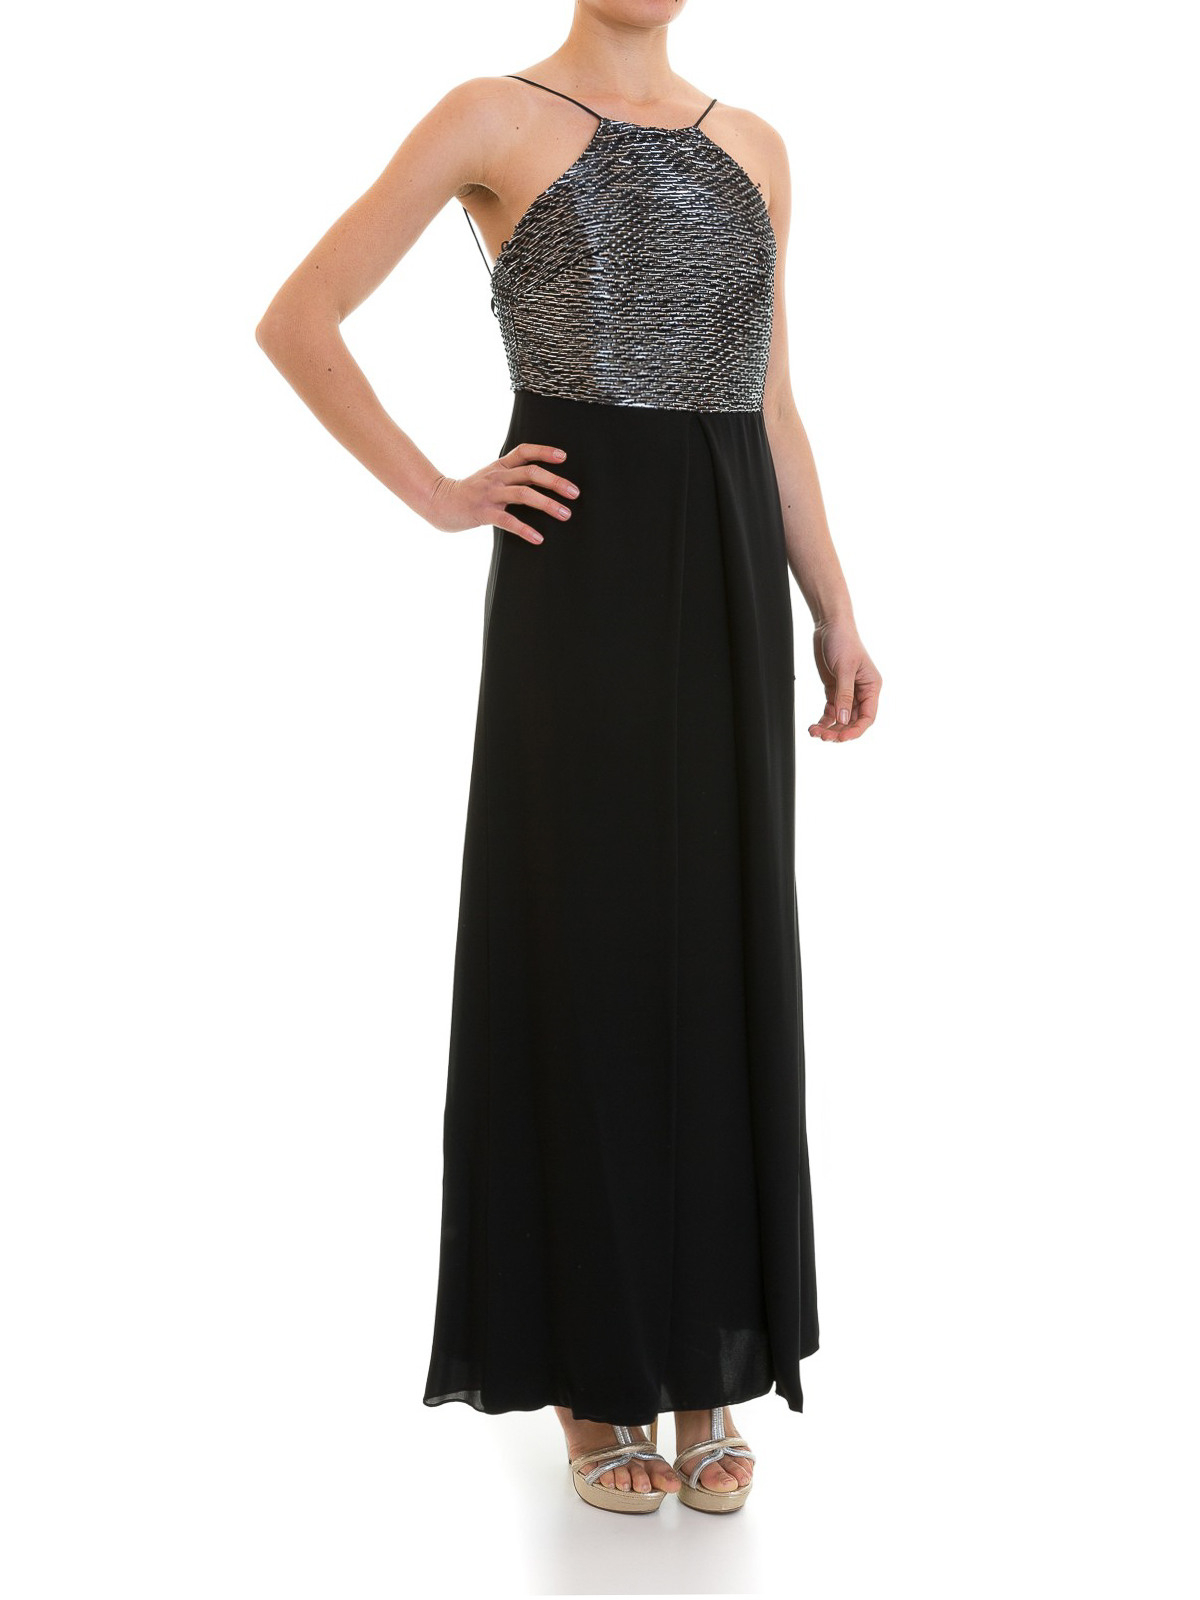 Spektakulär Armani Abendkleider Design13 Elegant Armani Abendkleider Stylish